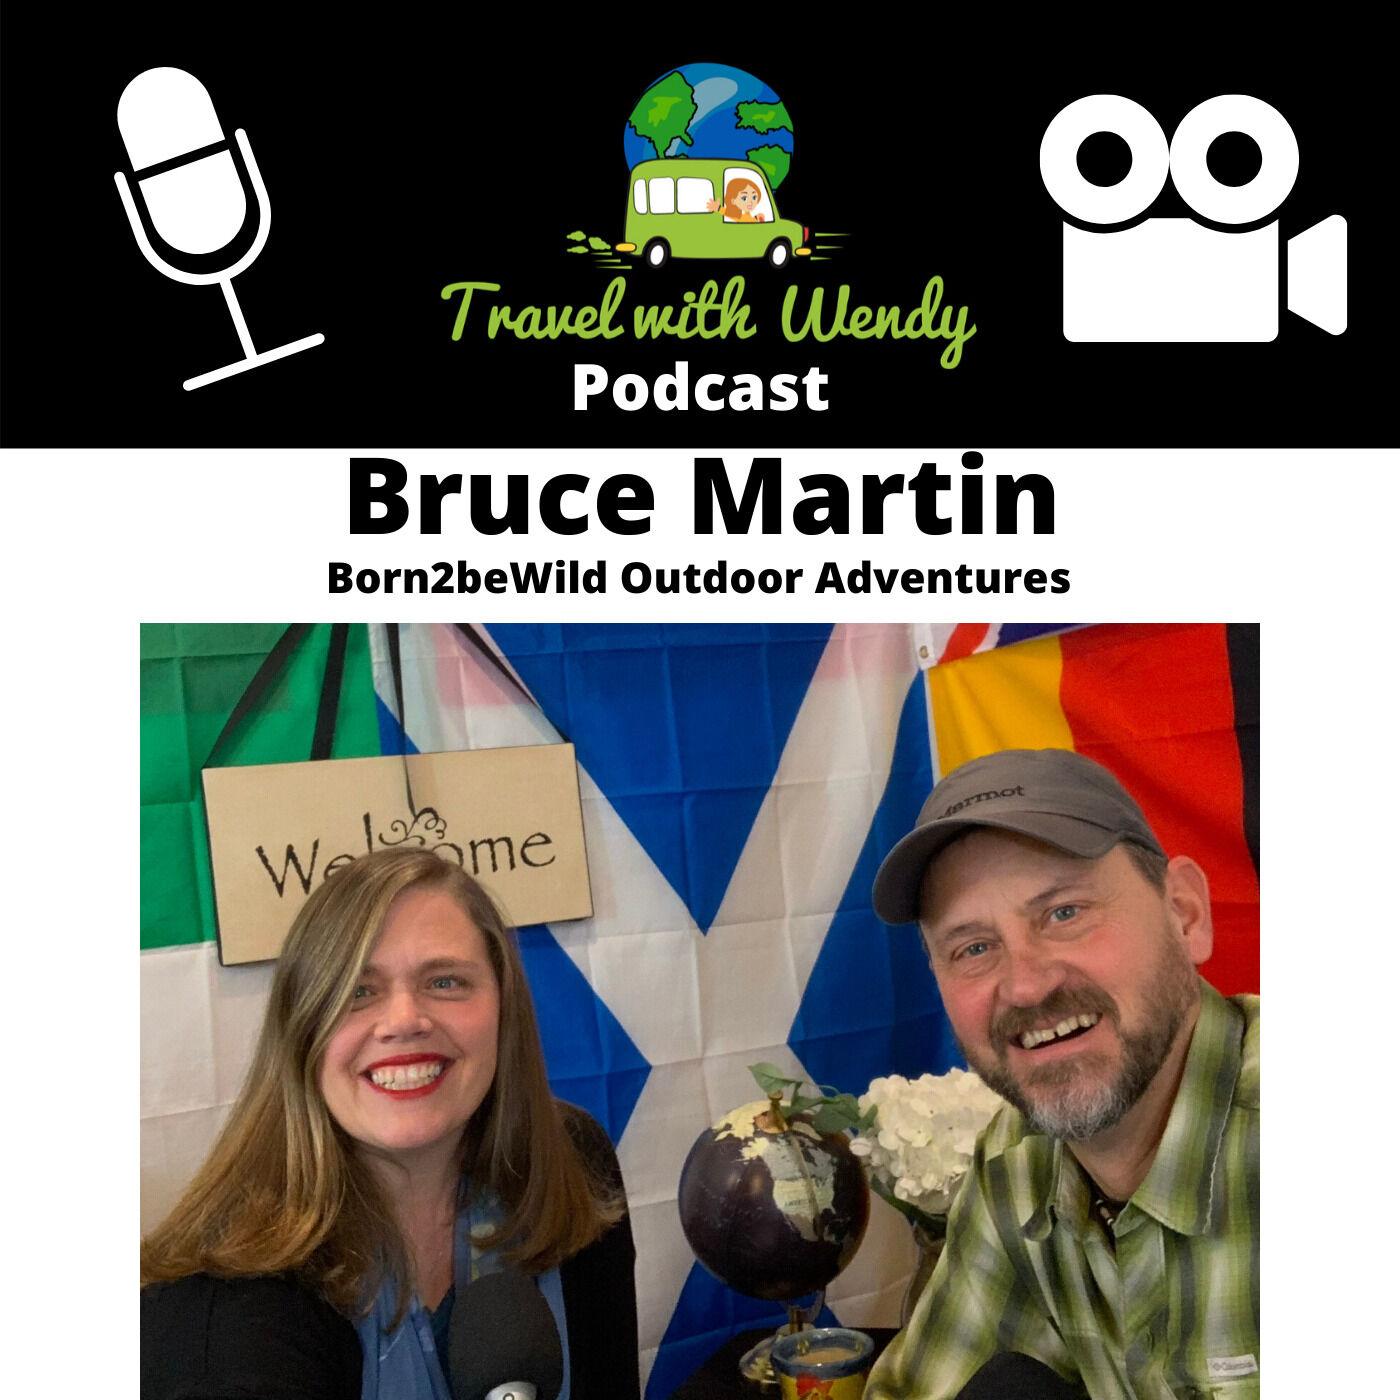 #1 Born2beWild - Bruce Martin